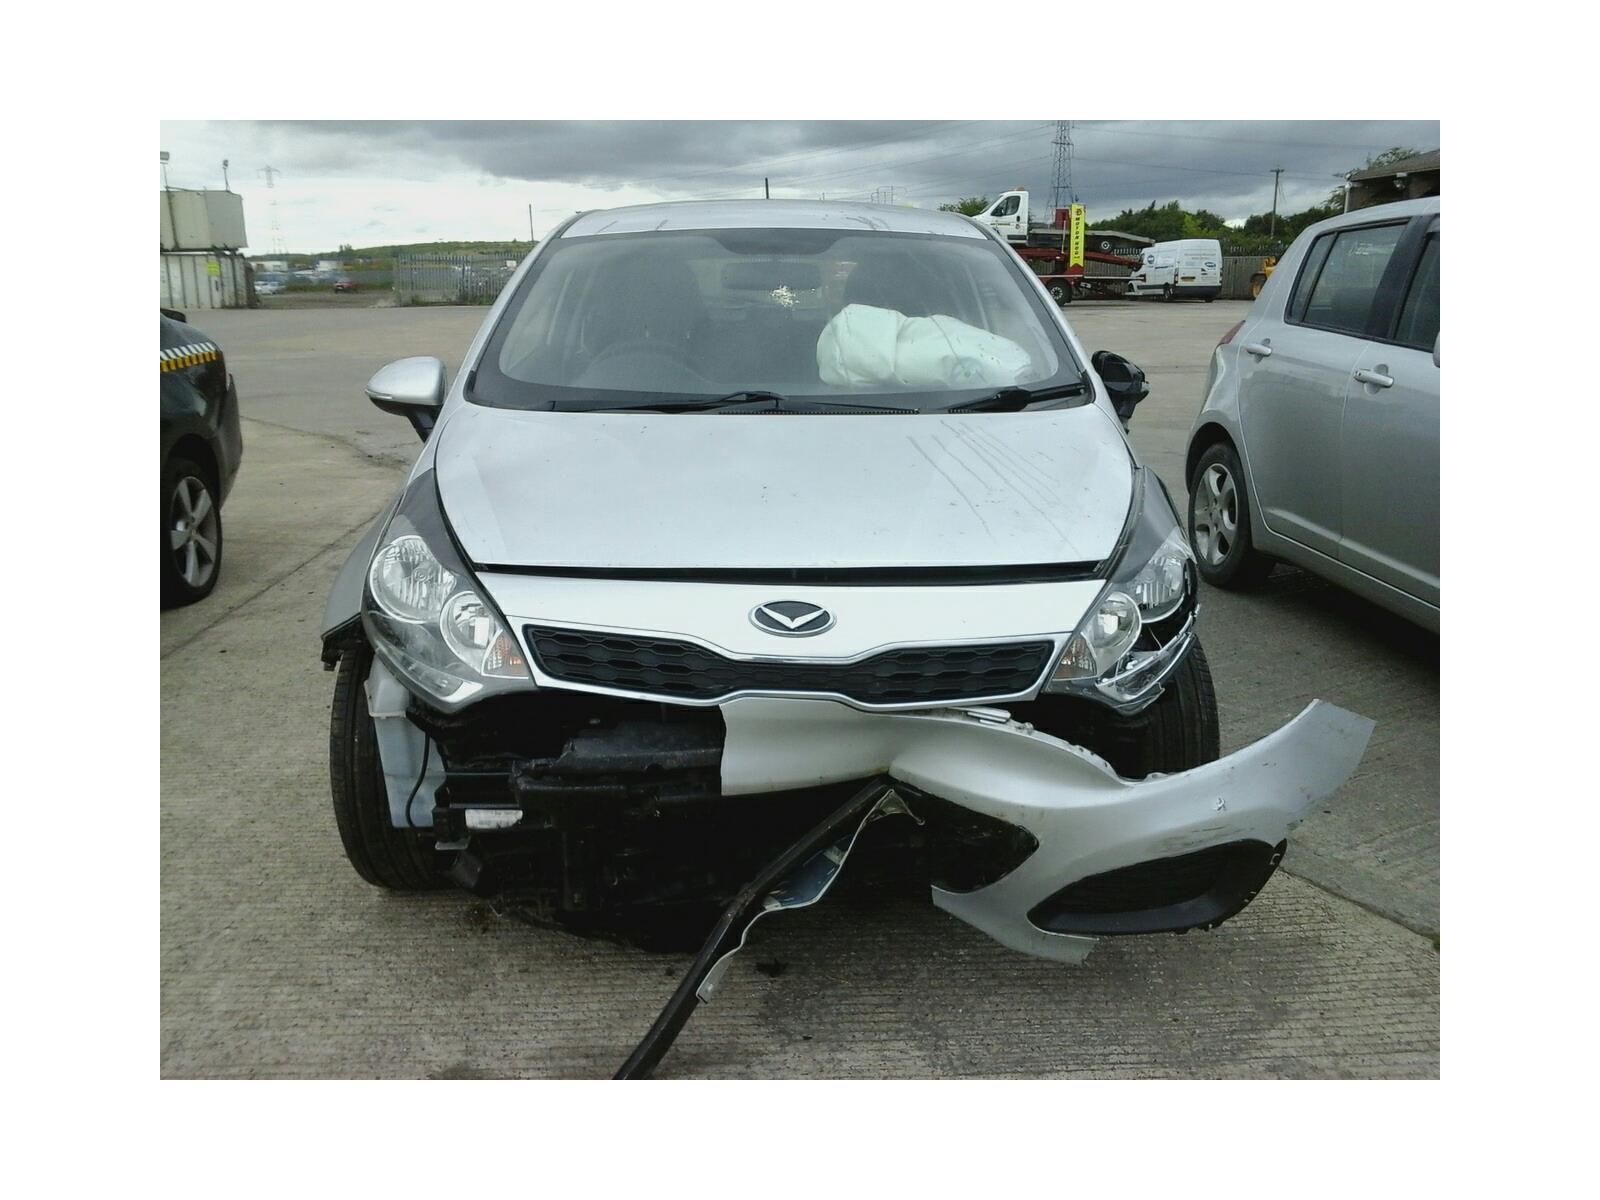 2012 kia rio 2011 to 2014 3 door hatchback petrol manual rh motorhog co uk owner manual kia rio 2012 manual kia rio 2012 español